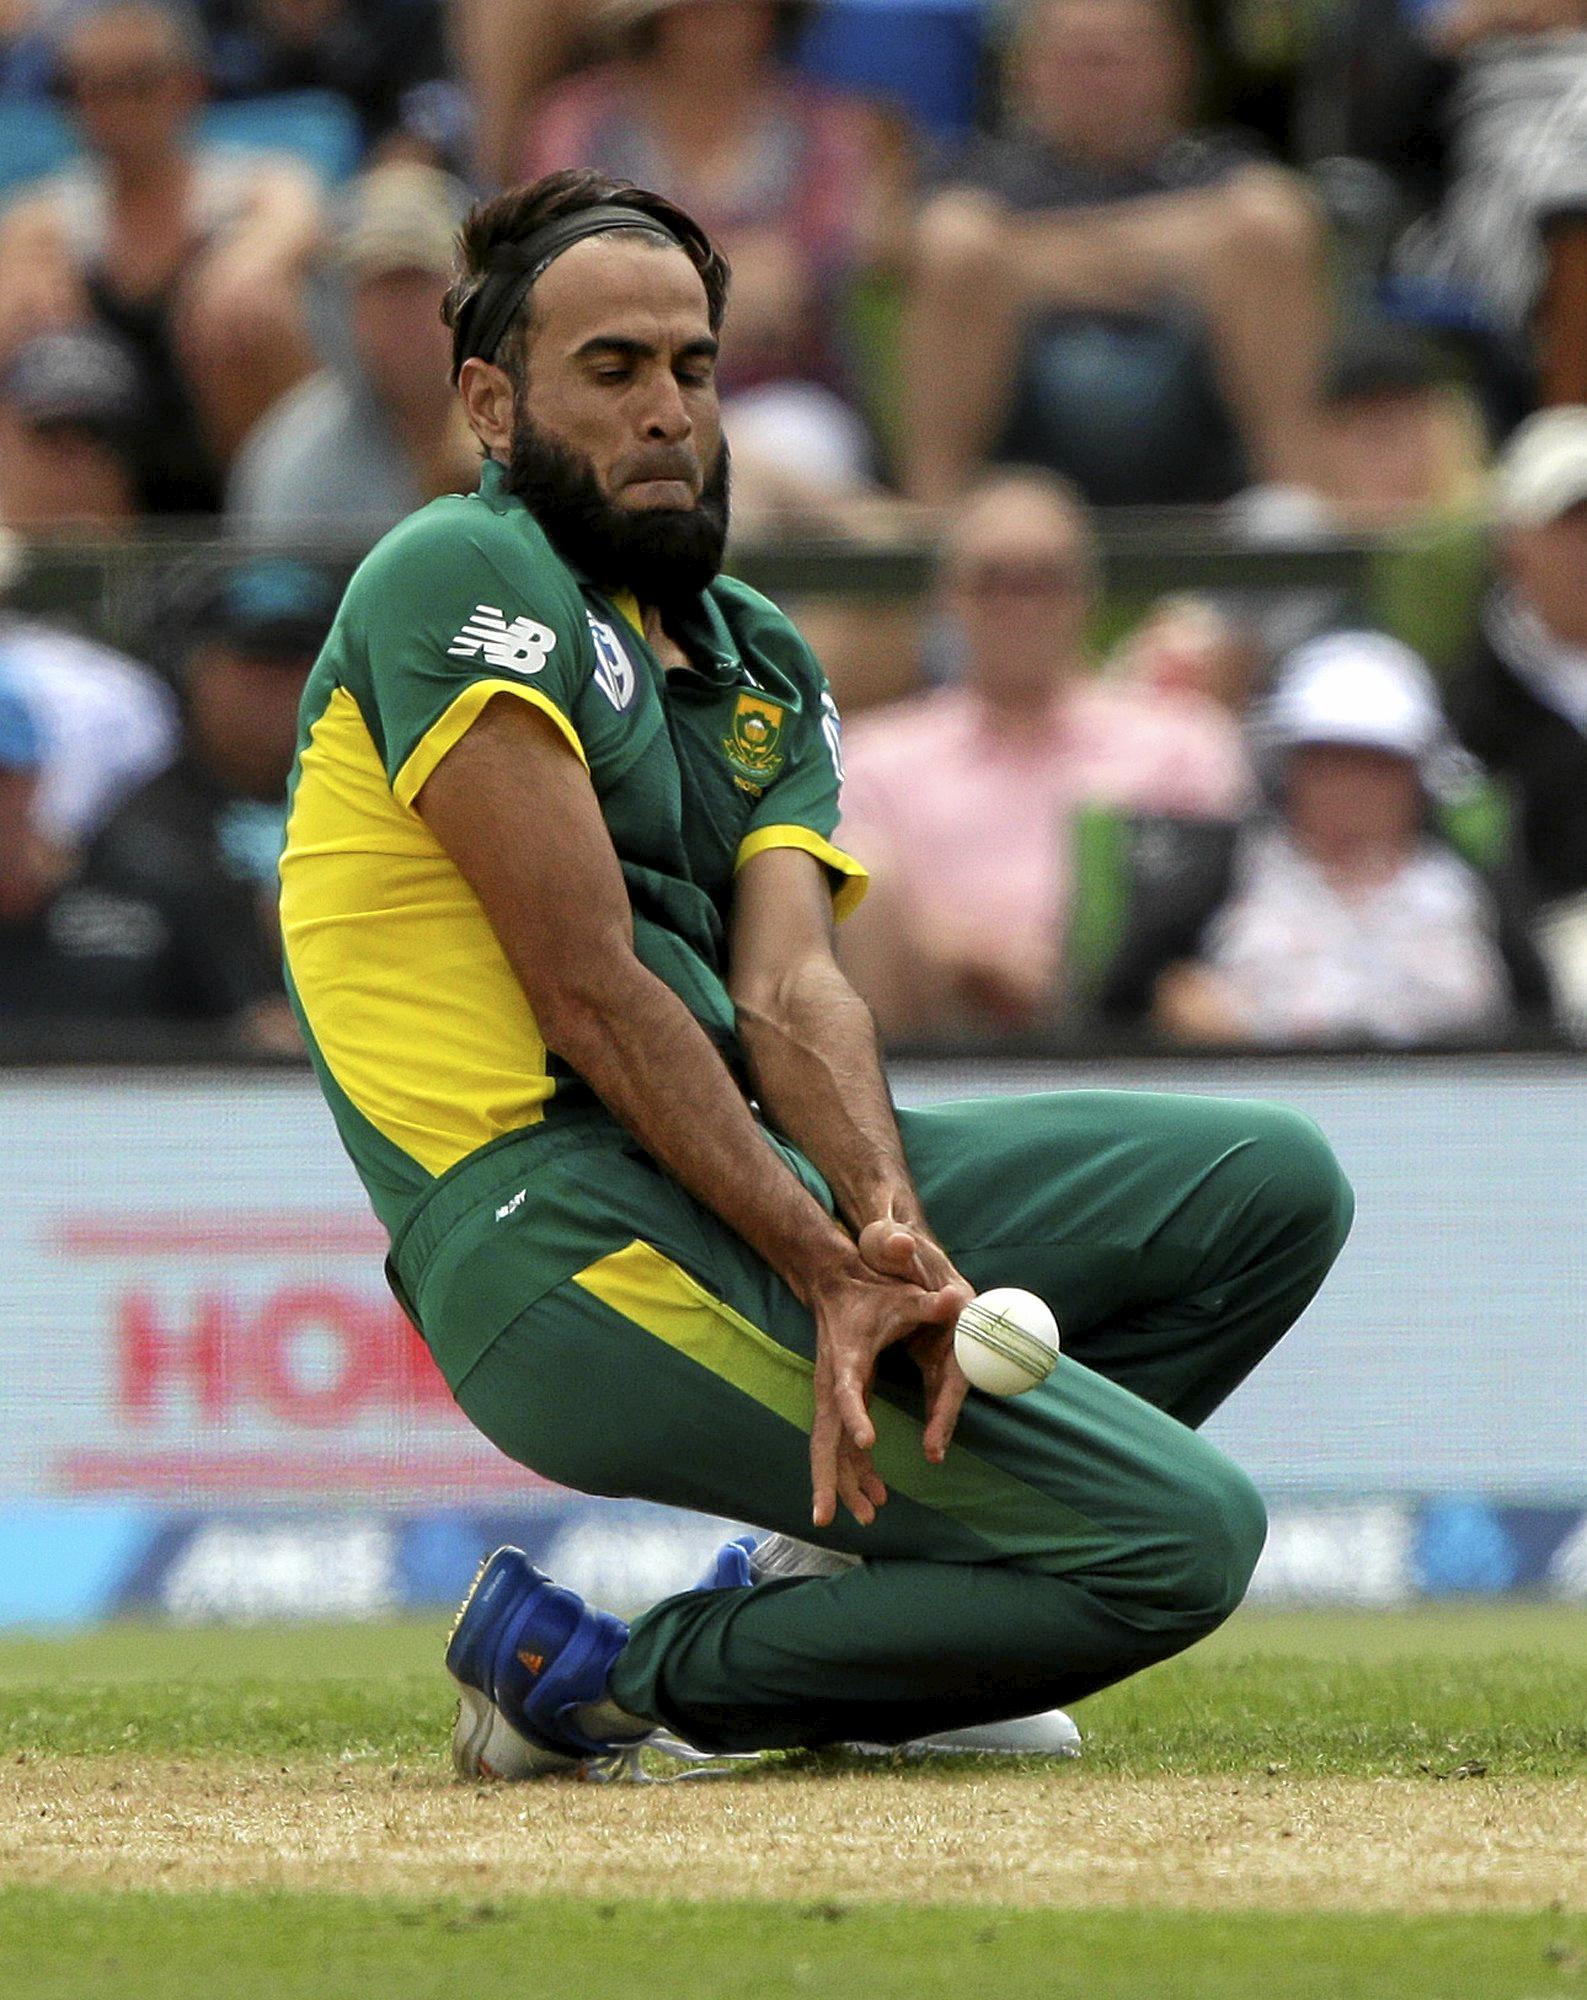 South Africa's Imran Tahir.